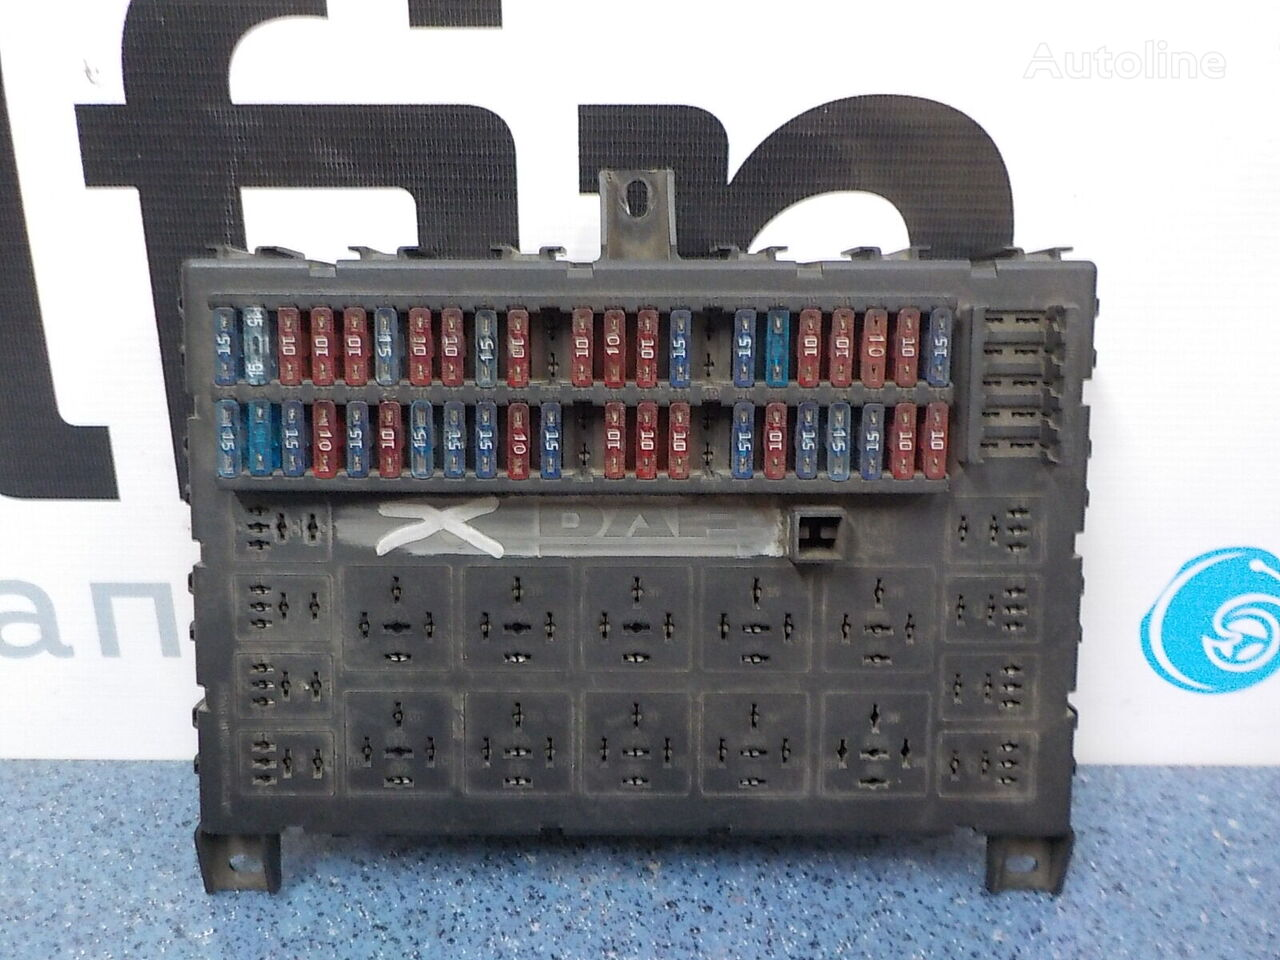 DAF caja de fusibles para DAF camión